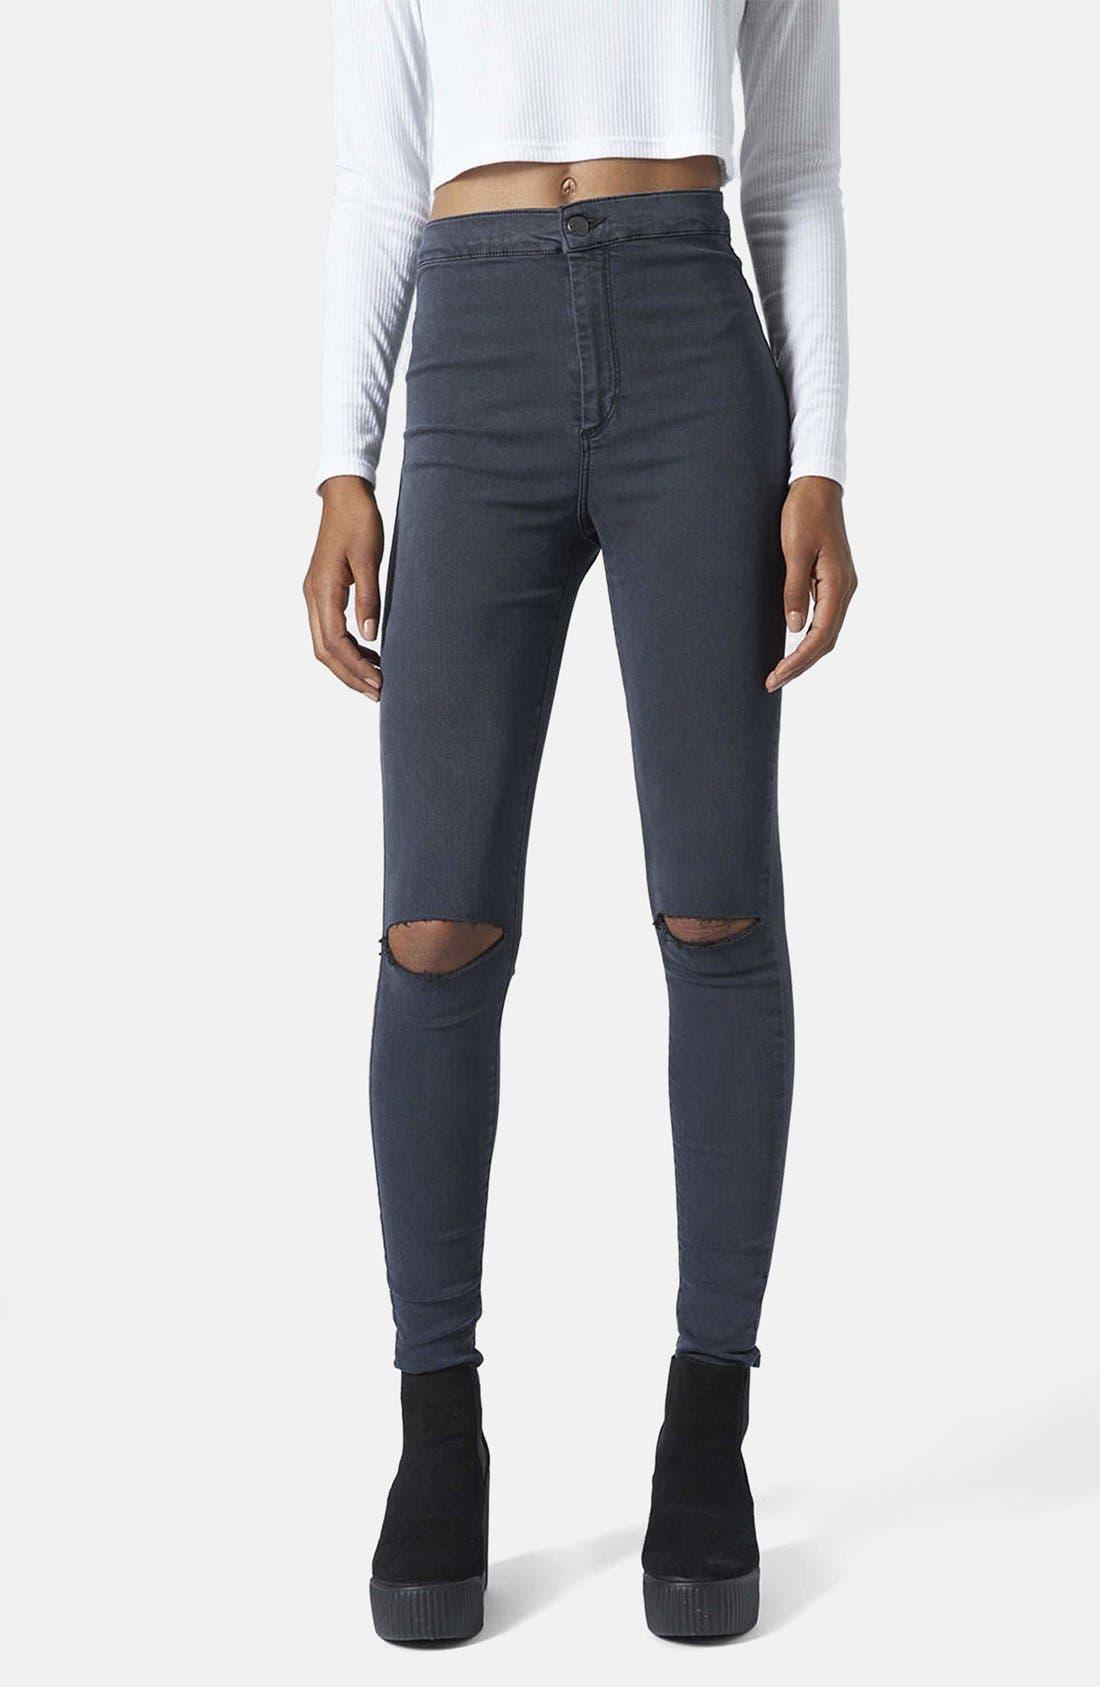 Alternate Image 1 Selected - Topshop Moto 'Joni' Ripped Jeans (Blue) (Regular & Short)